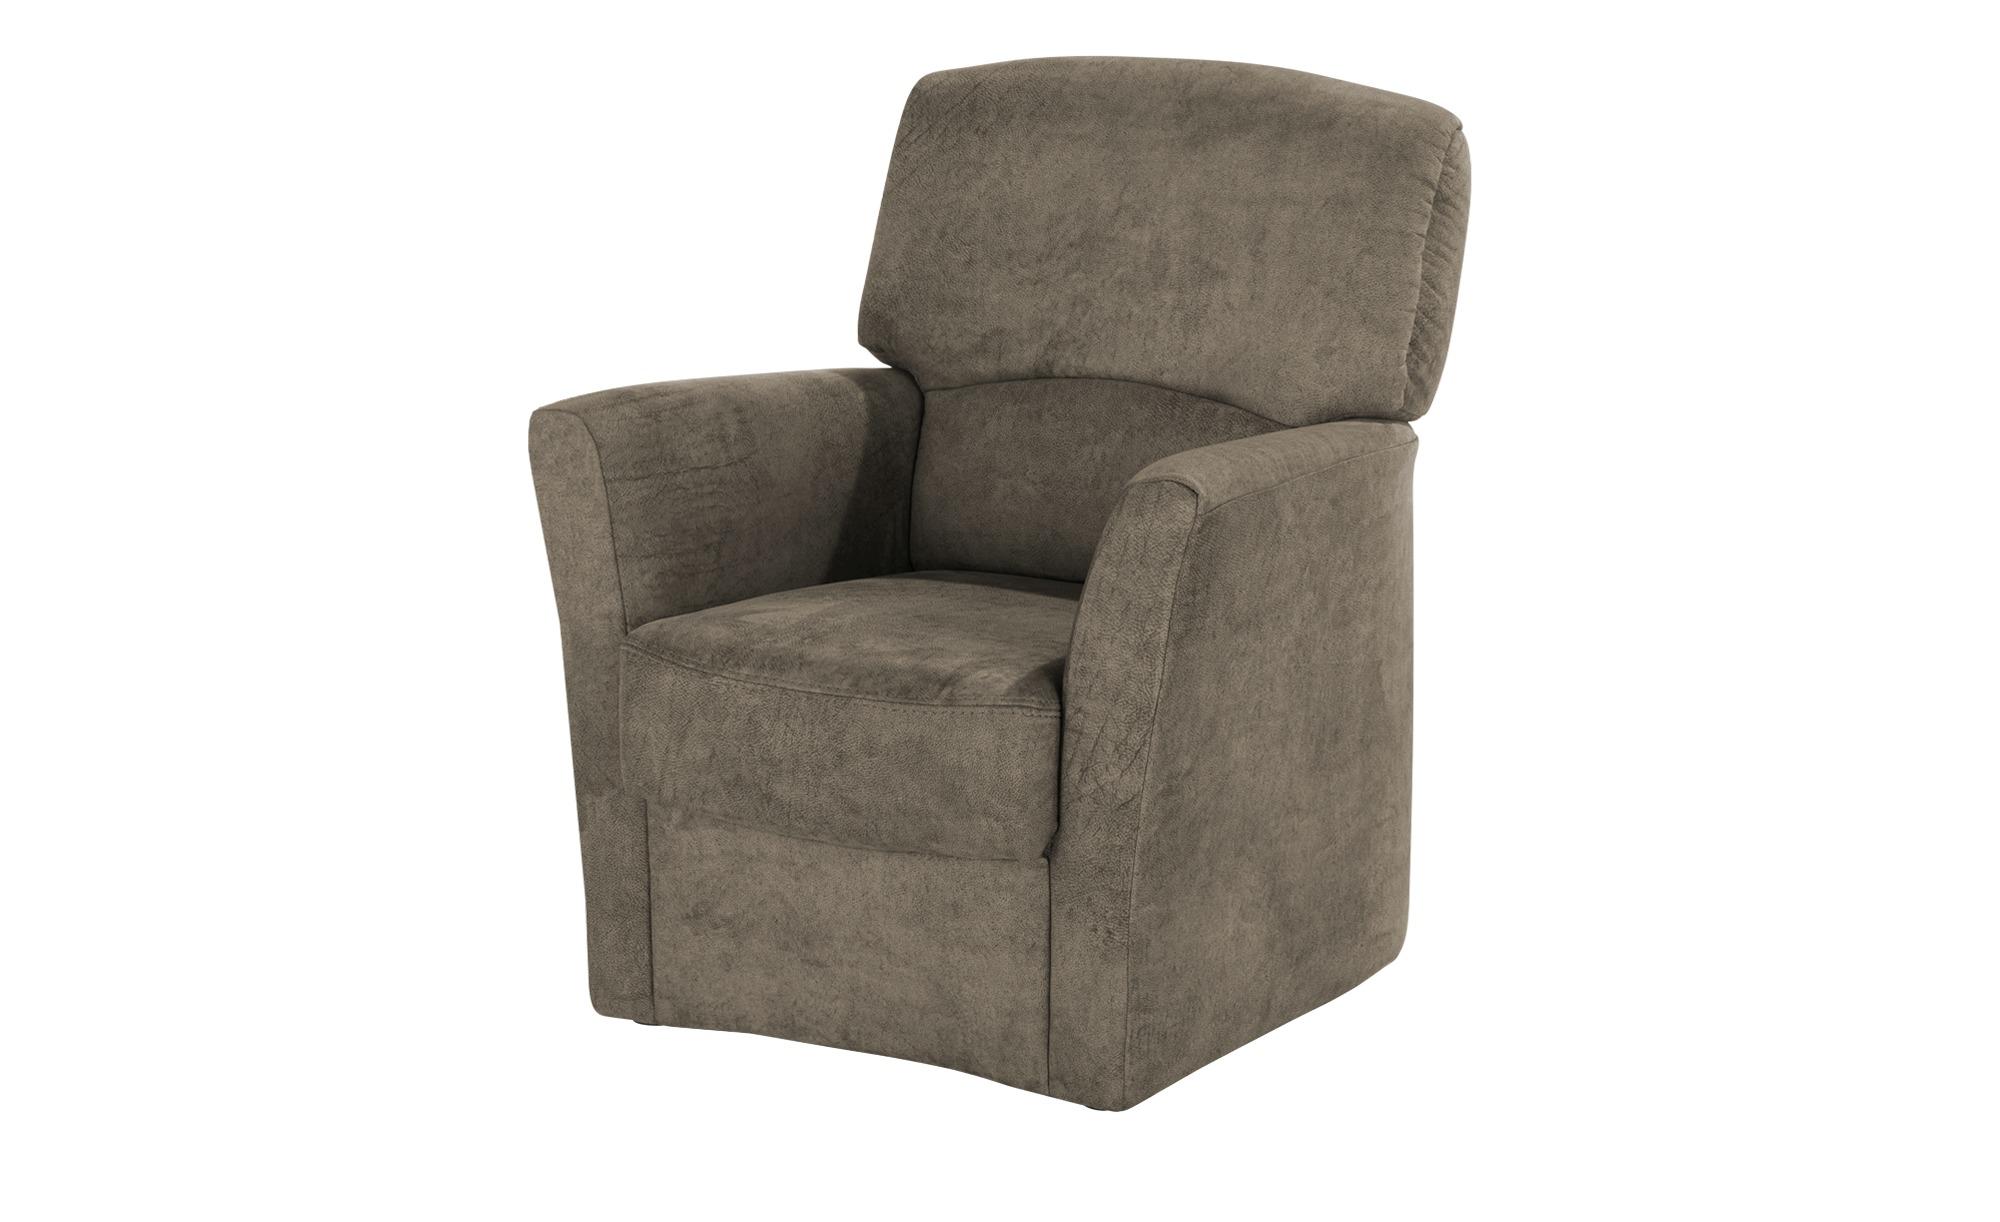 Polstermöbel Oelsa Sessel  Toga ¦ braun ¦ Maße (cm): B: 75 H: 92 T: 80 Polstermöbel > Sessel > Polstersessel - Höffner